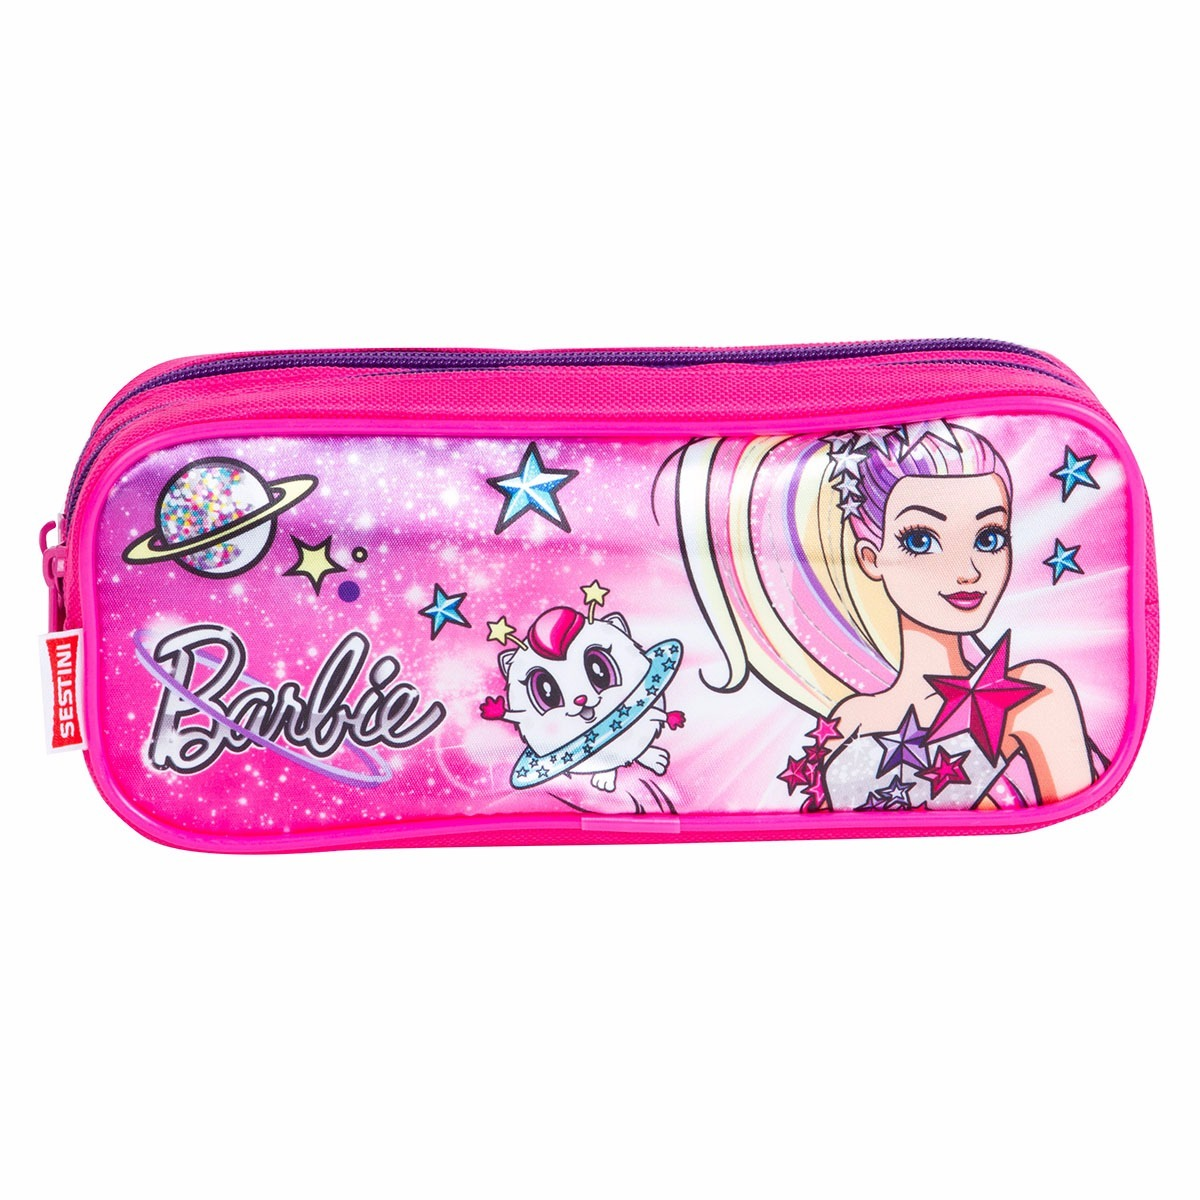 854182bbe kit mochila infantil bau barbie aventura nas estrela sestini. 6 Fotos